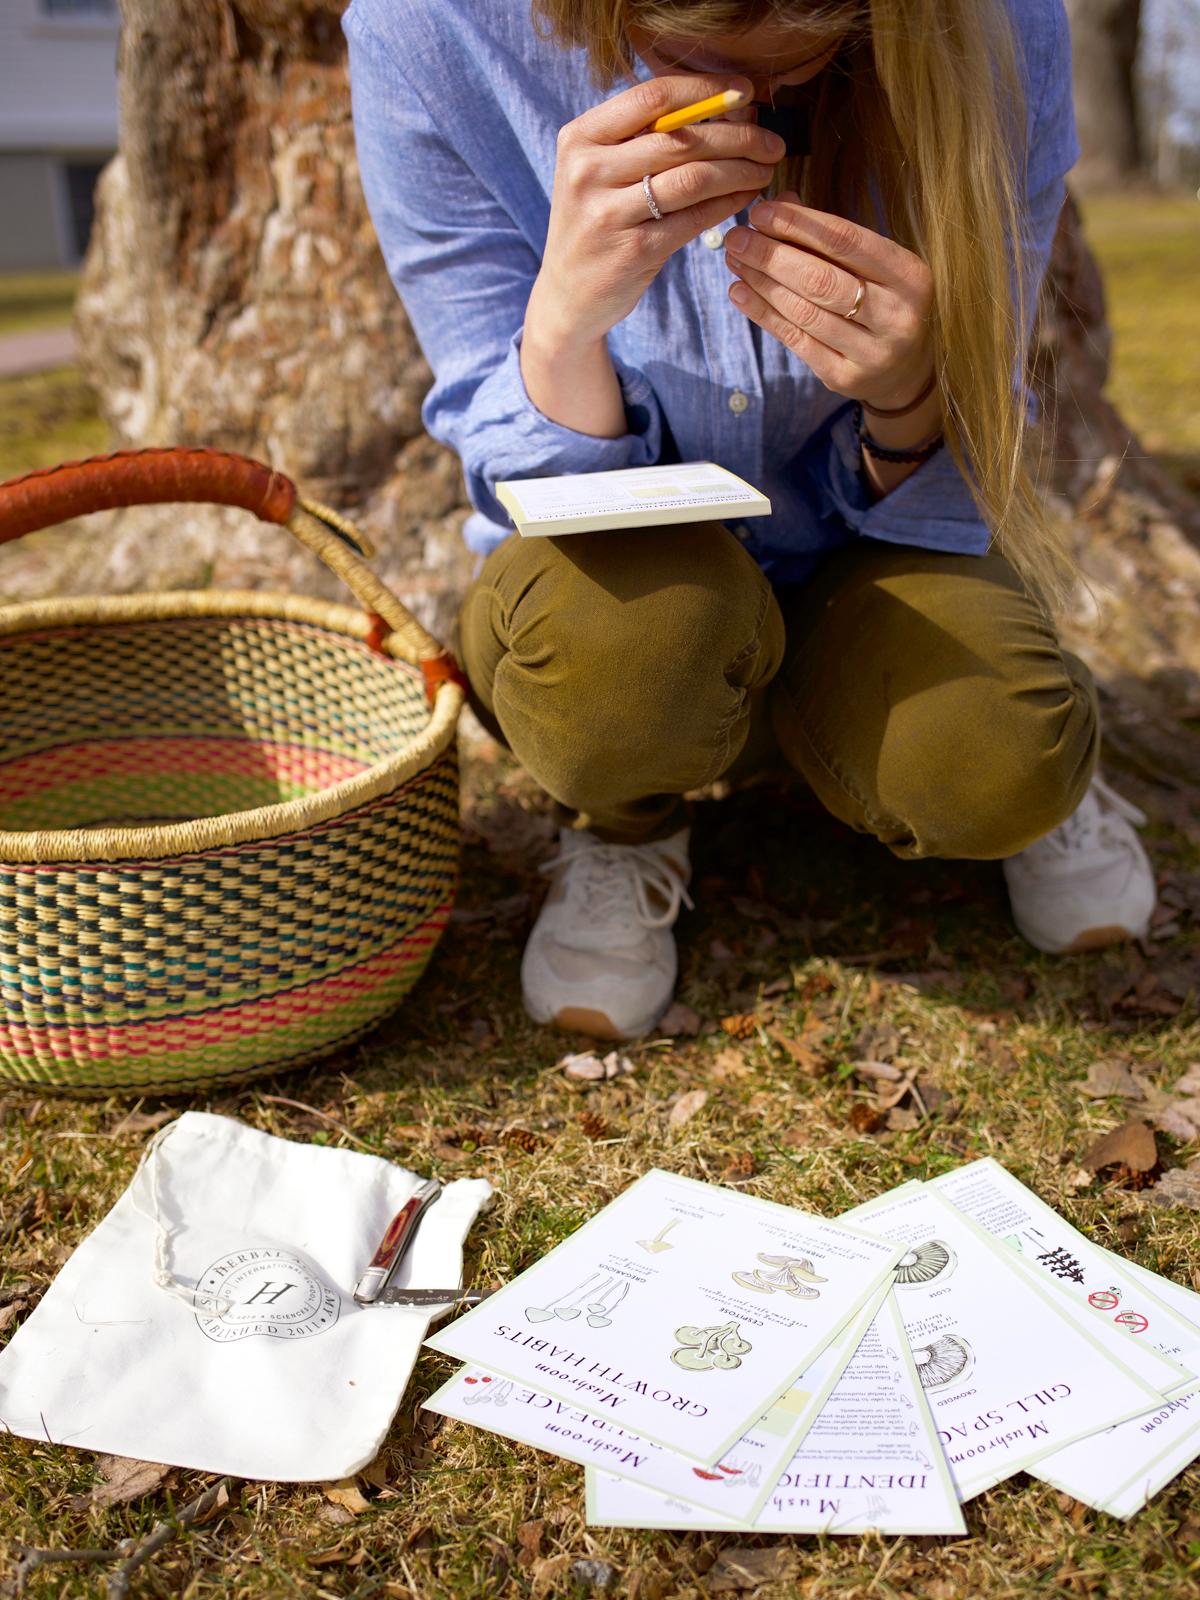 The Mushroom Foraging Kit by Herbal Academy